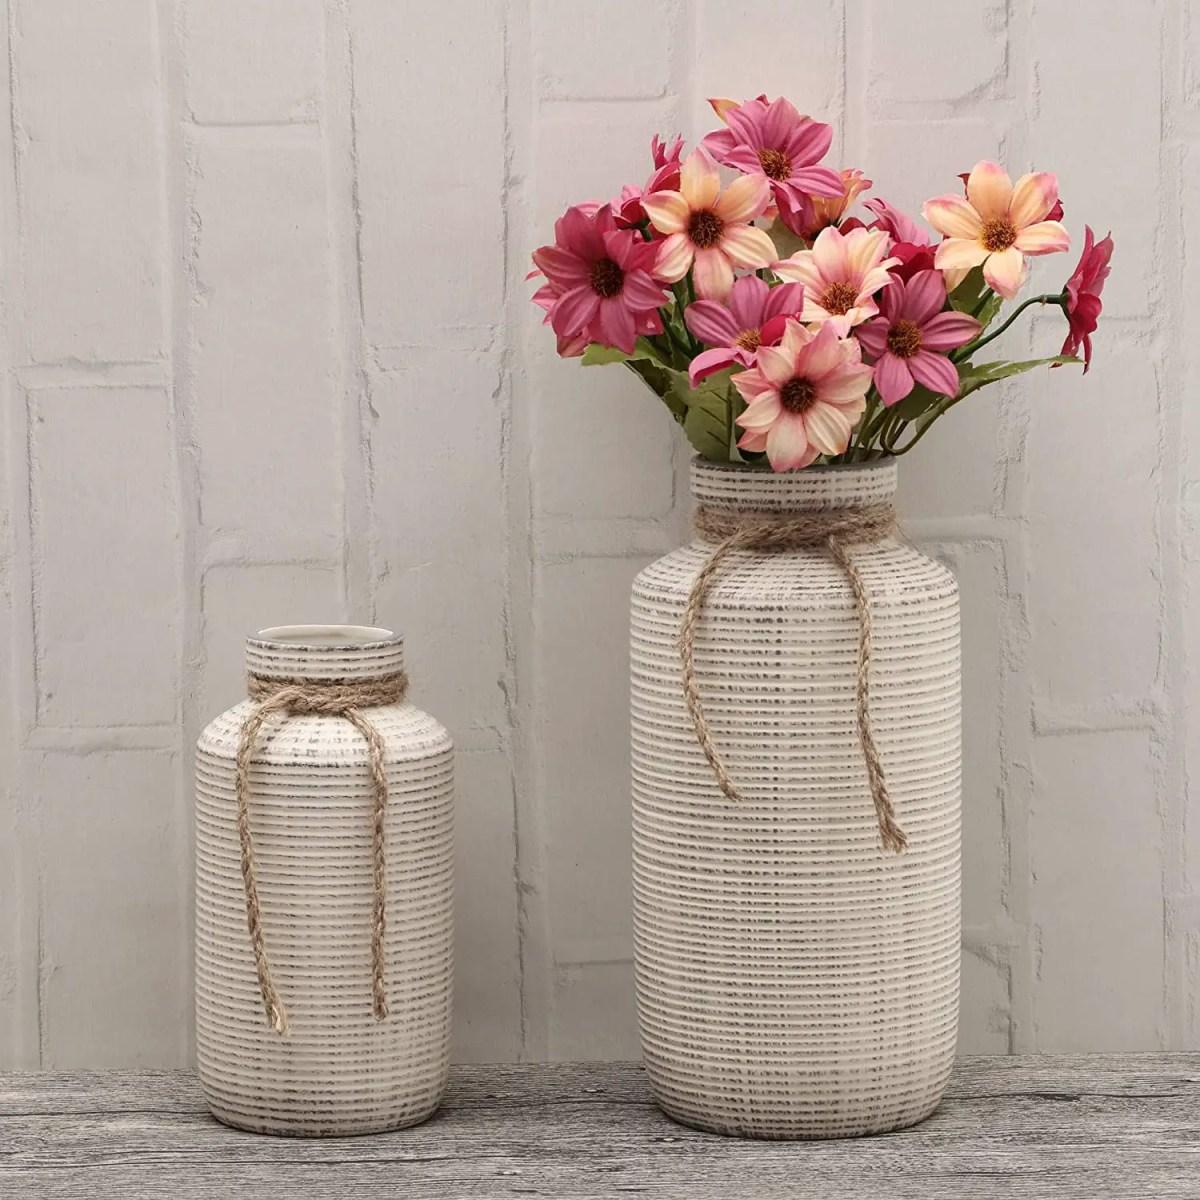 Modern-Frrmhouse-Decorate-with-a-Farmhouse-Vase